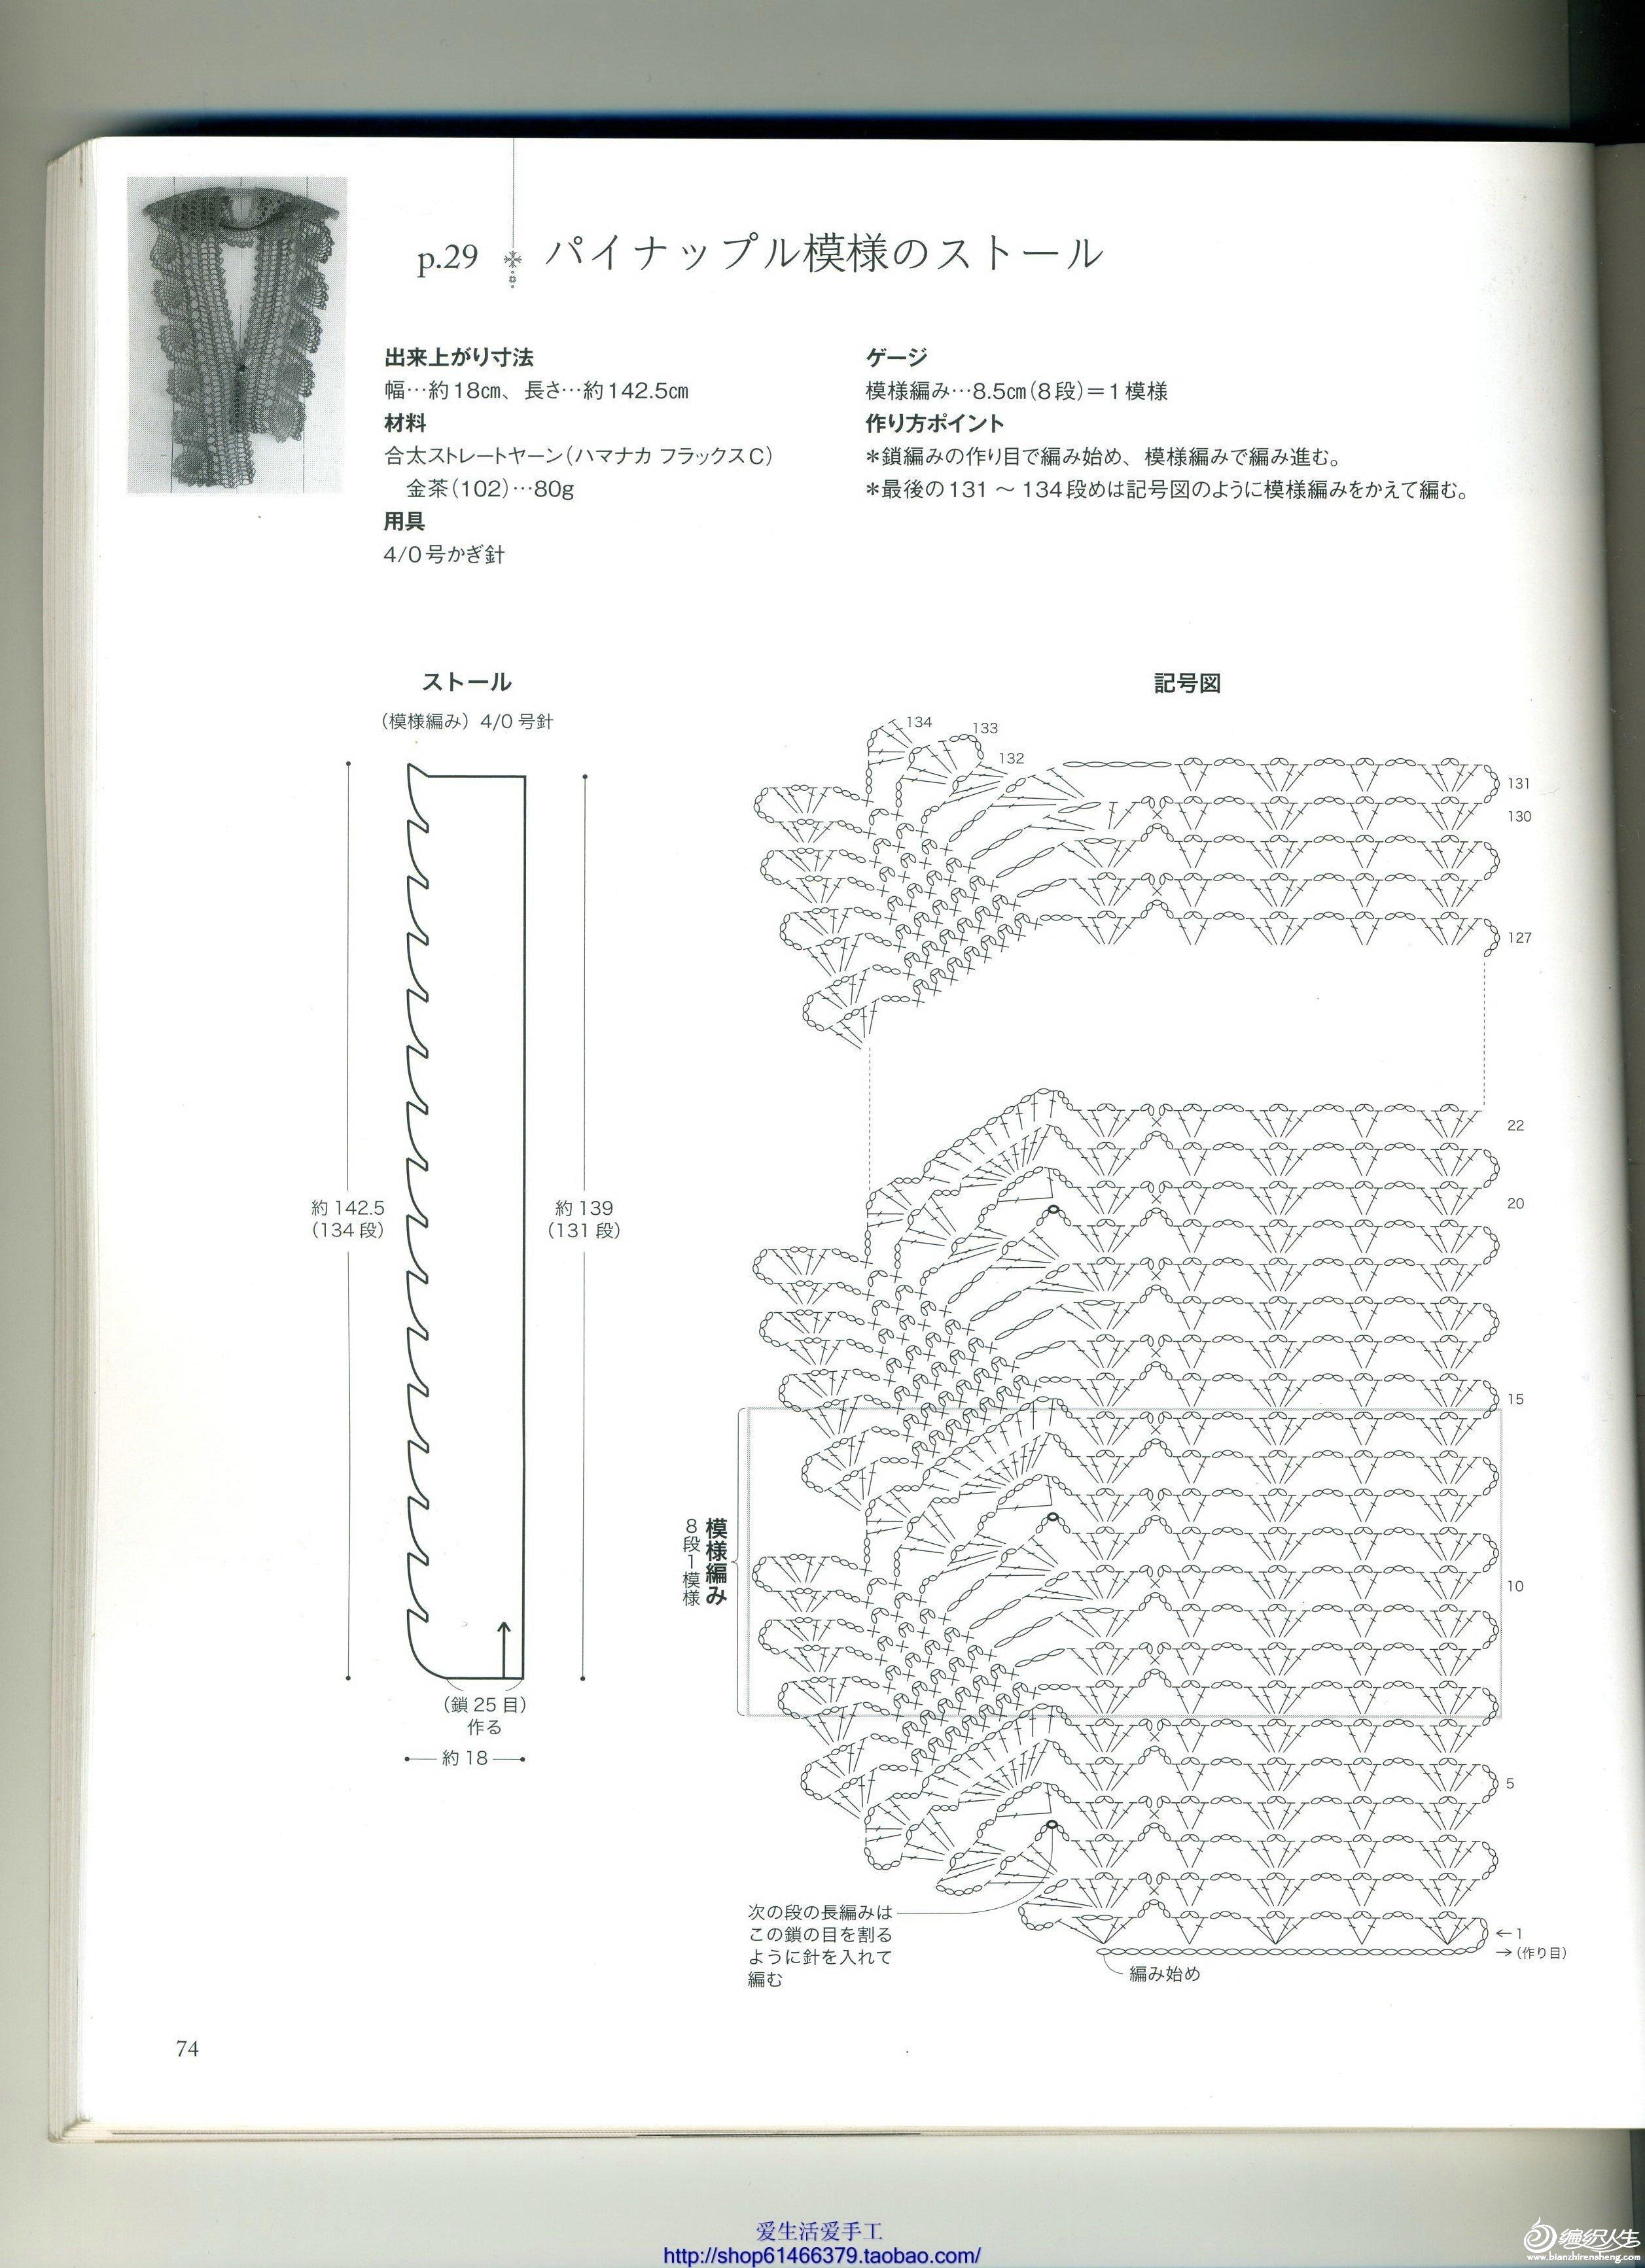 复件 104348cgze7o18egkshg4h.jpg